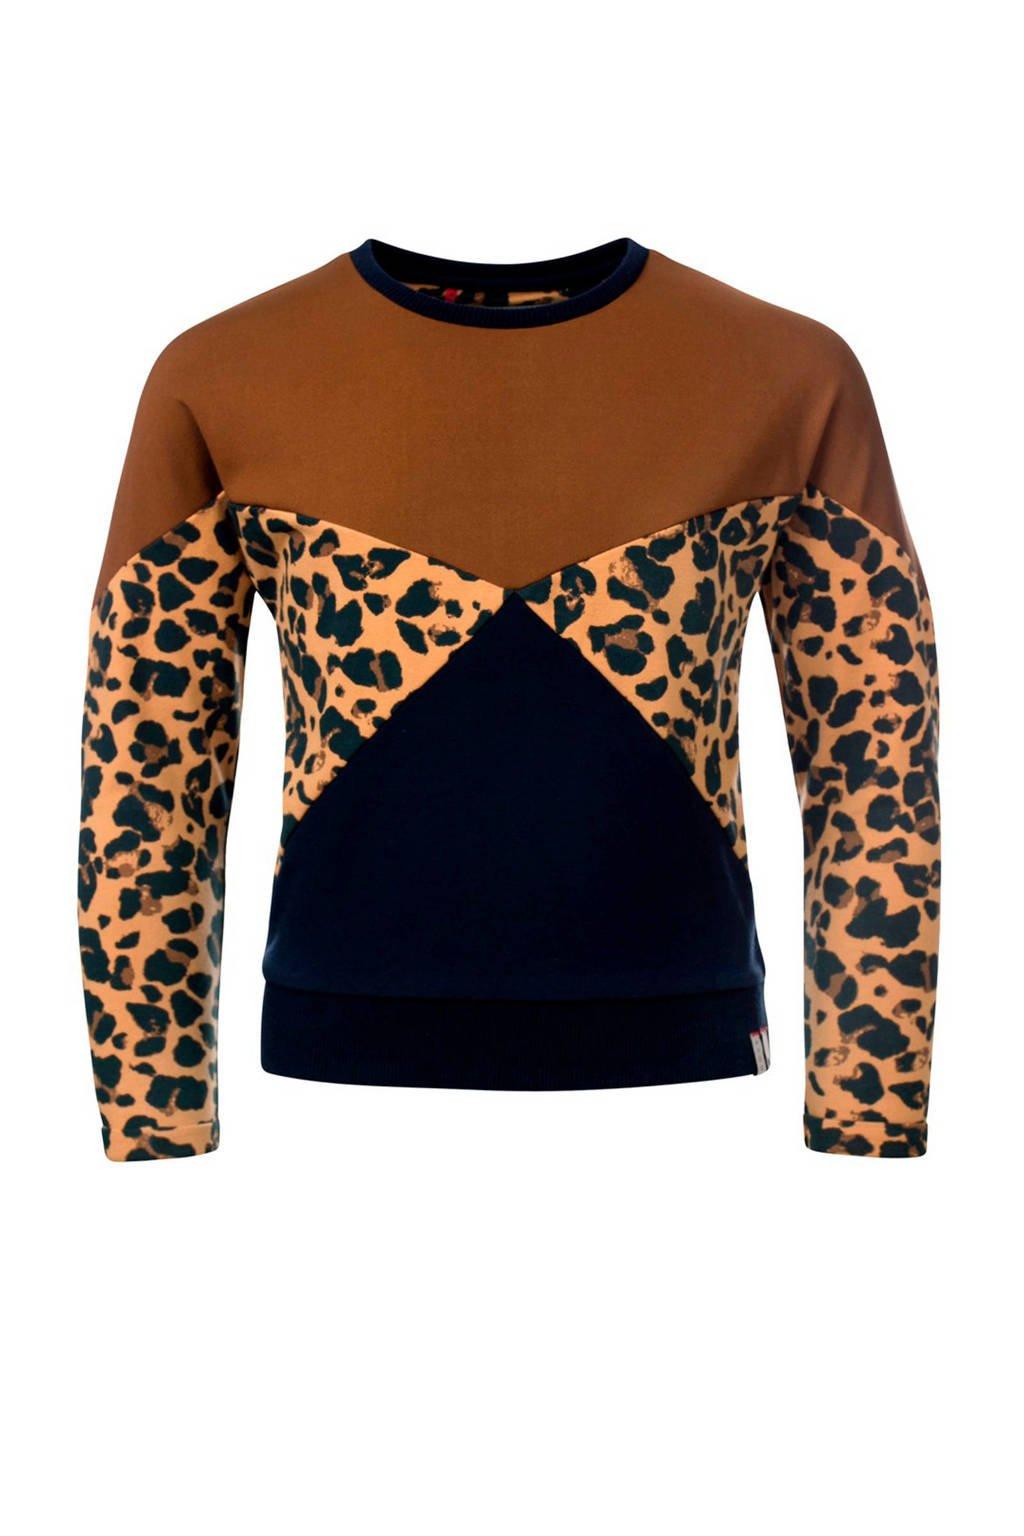 LOOXS sweater met all over print bruin/marine, Bruin/marine